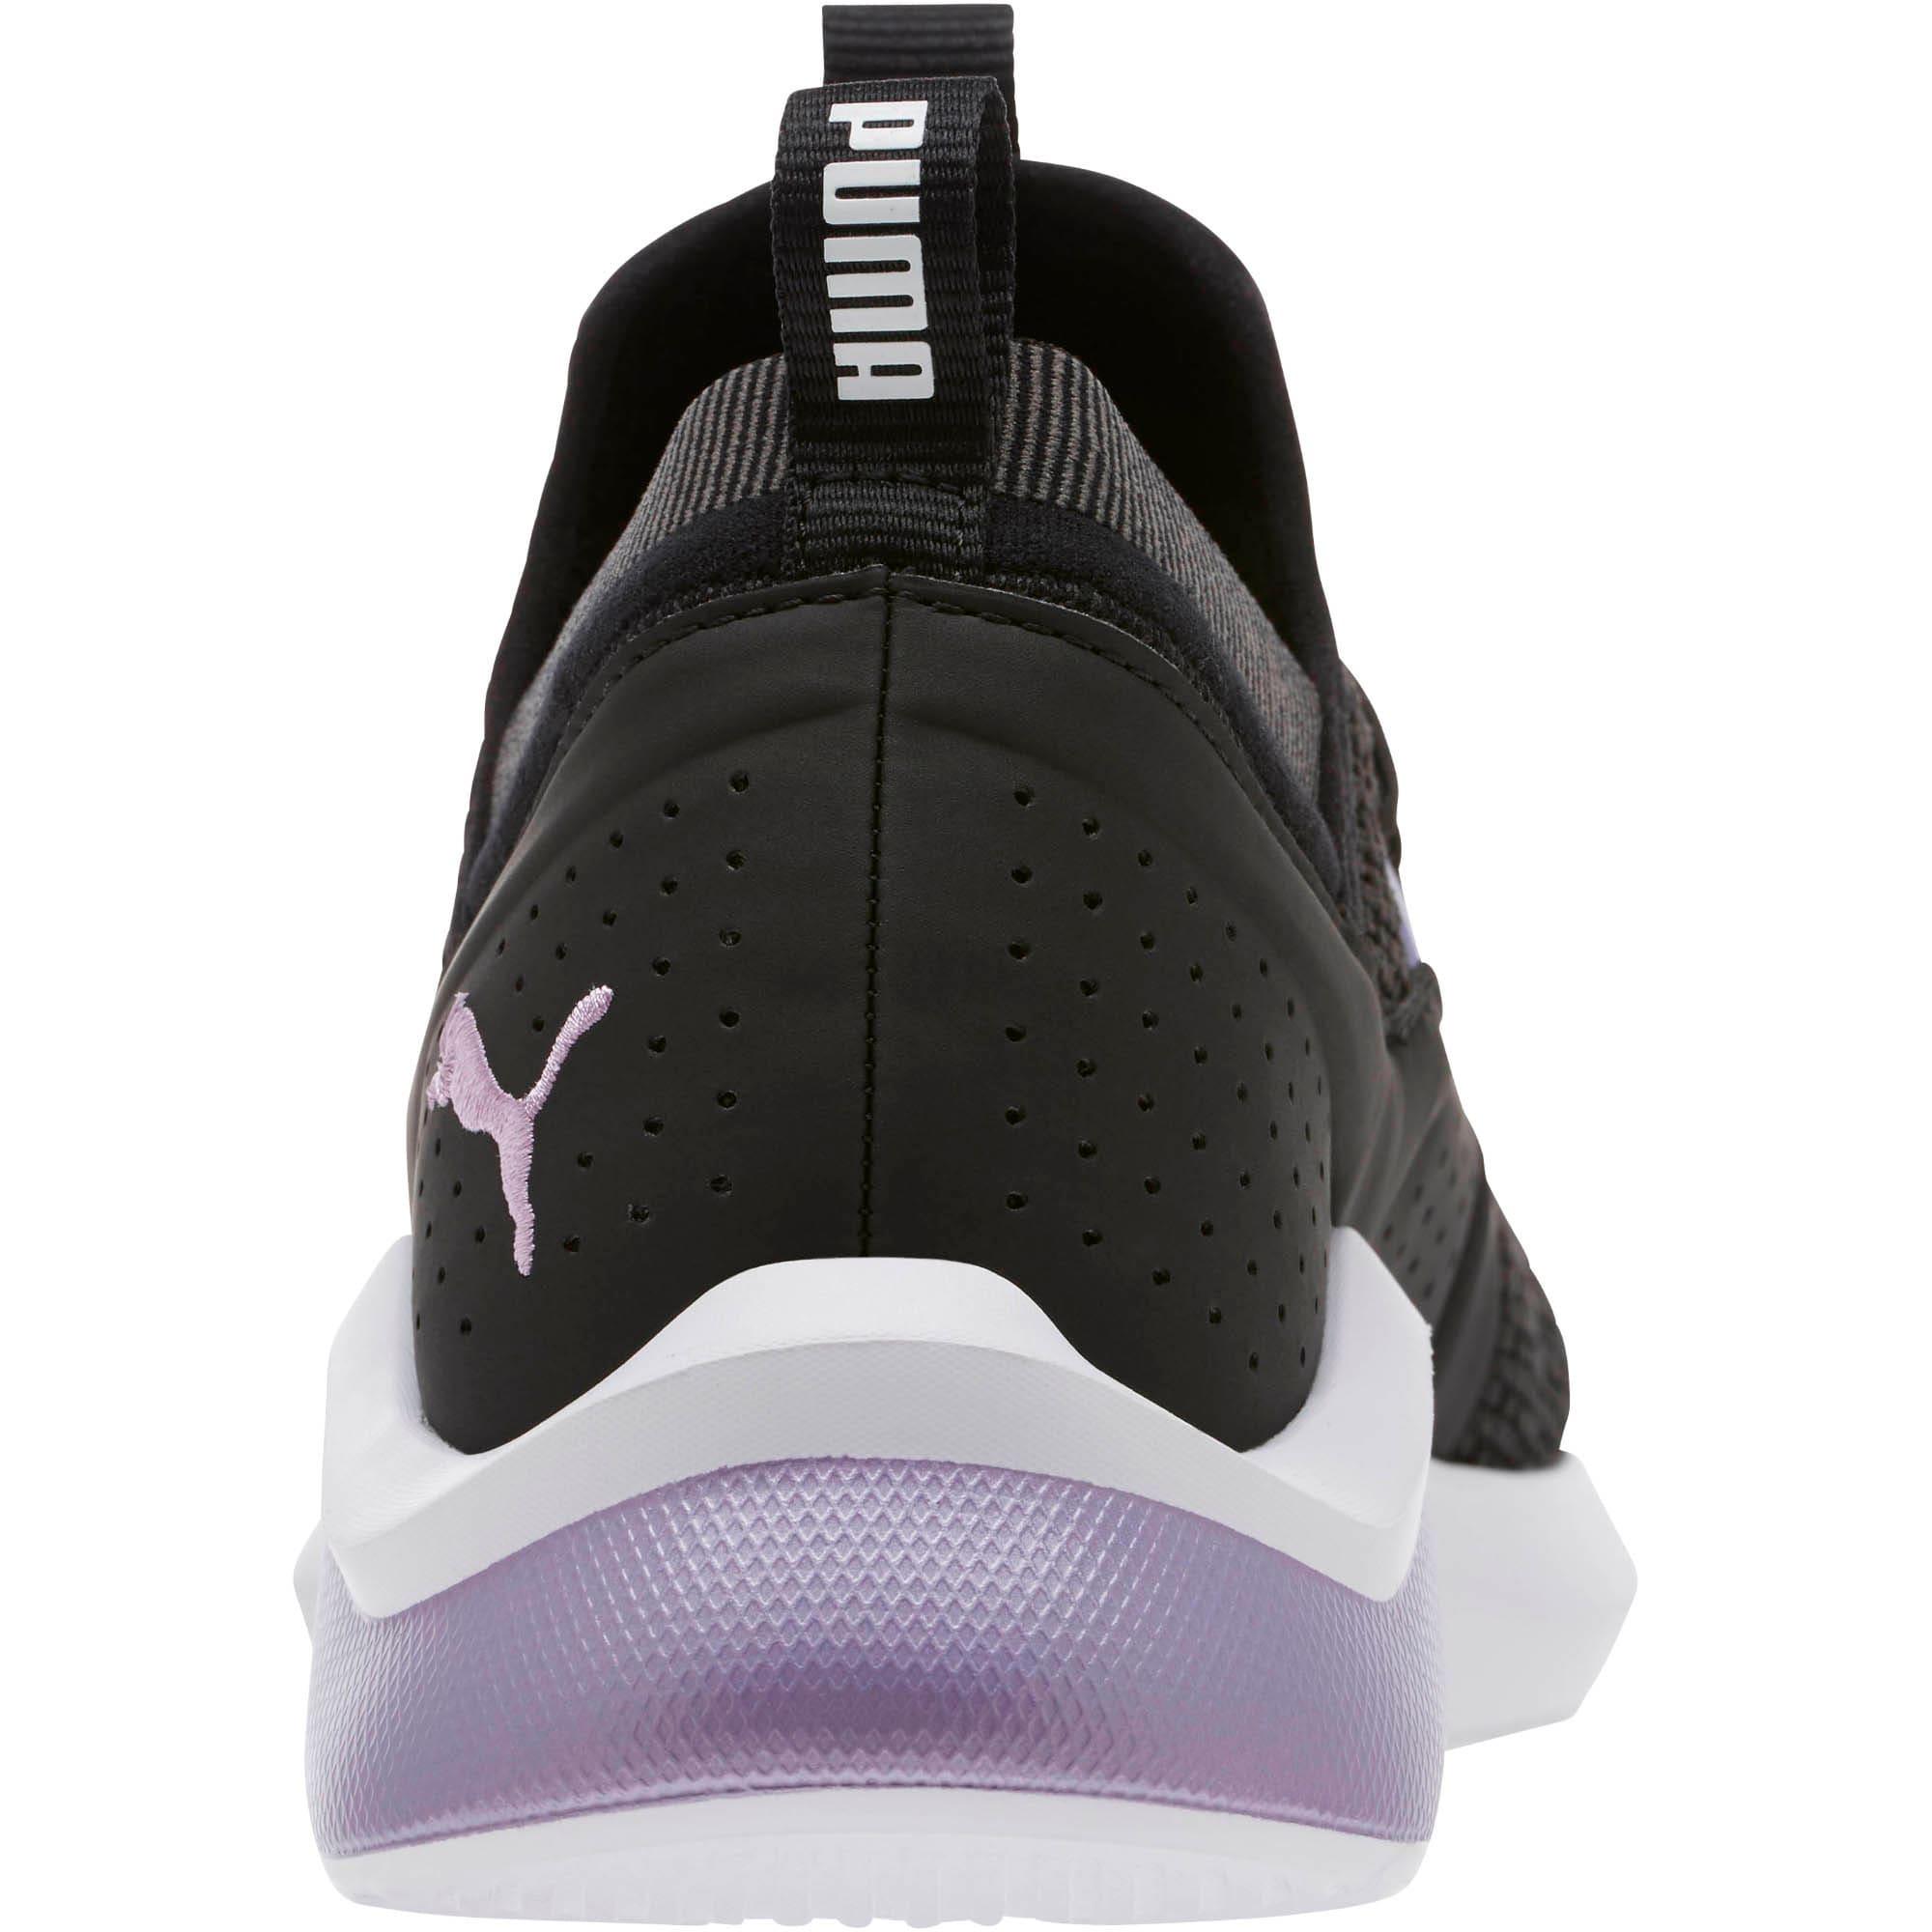 Thumbnail 4 of Emergence Cosmic Women's Sneakers, Puma Black-Sweet Lavender, medium